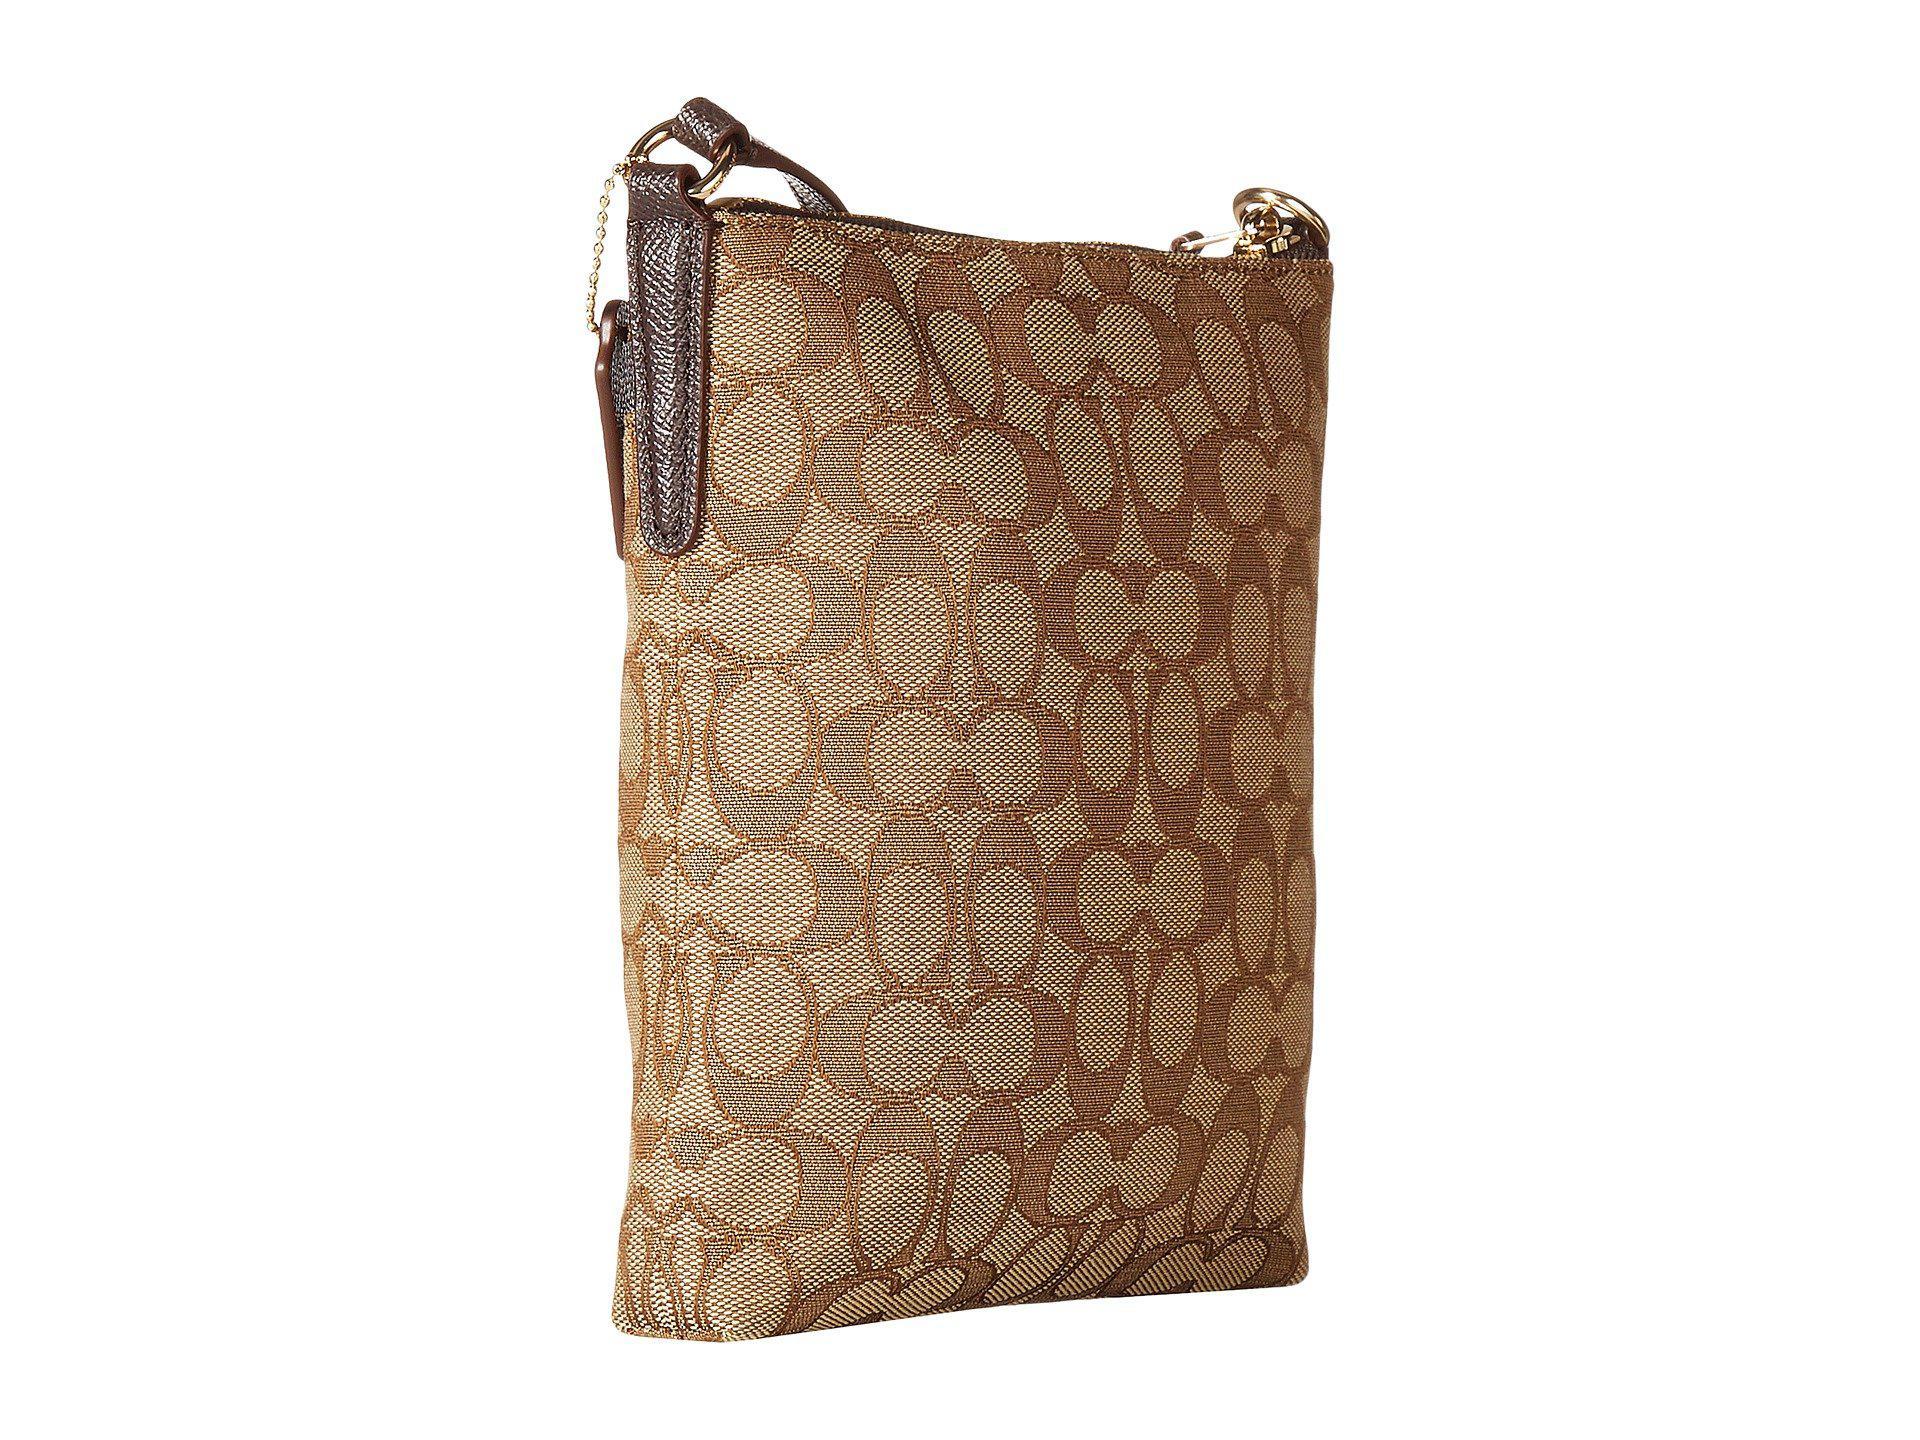 2c6cb93319 COACH - Signature Messenger Crossbody (light khaki brown) Cross Body  Handbags -. View fullscreen